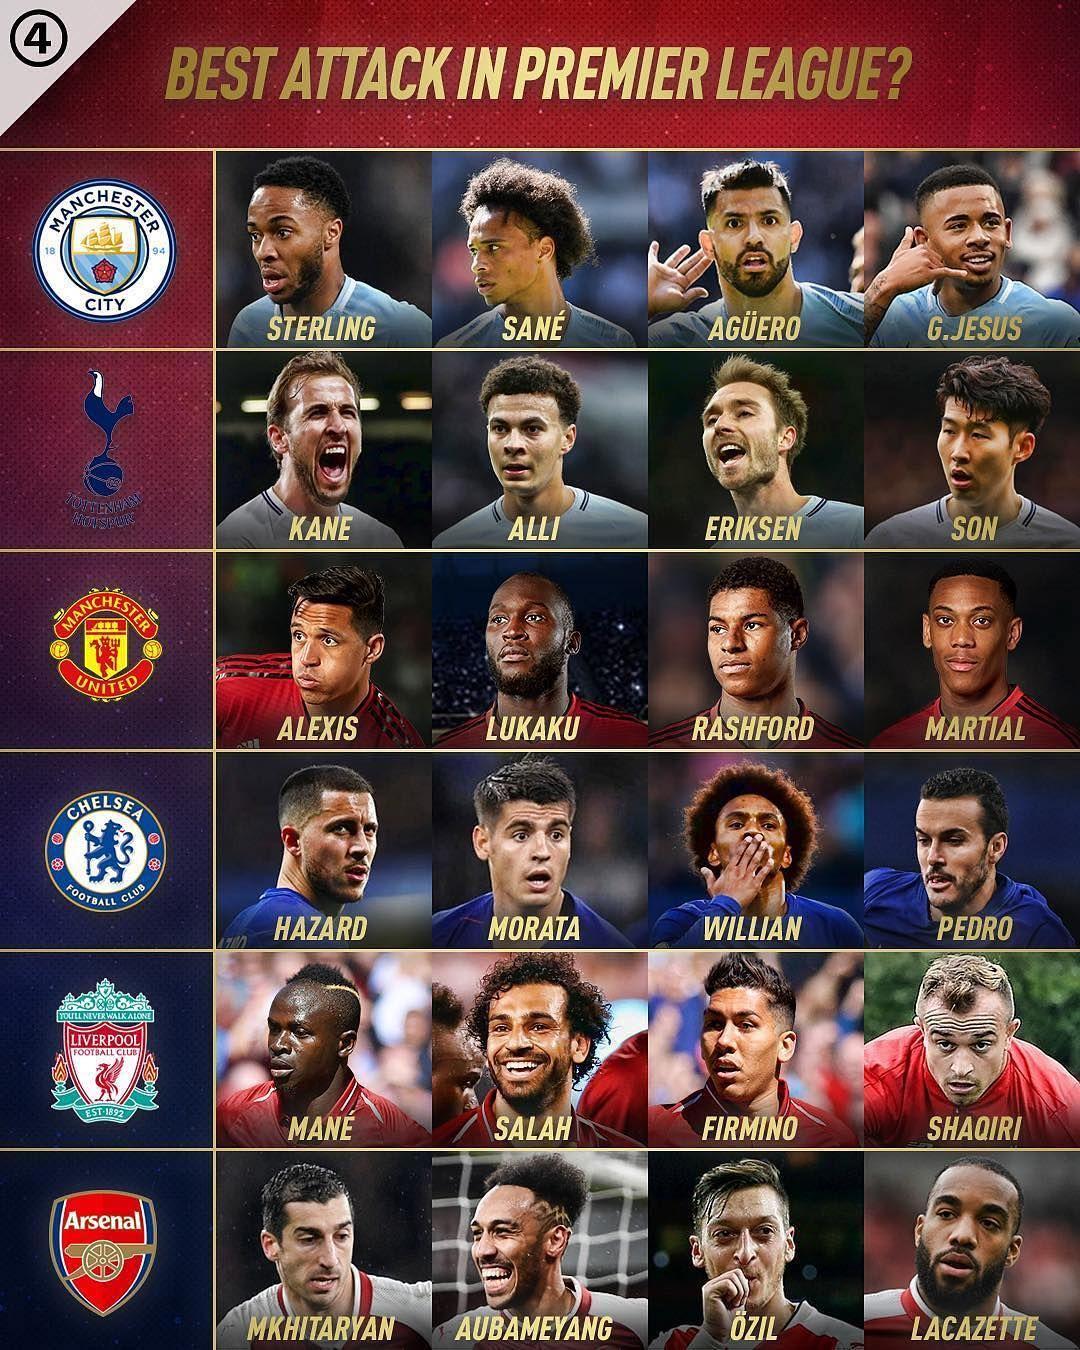 Premier league football image by Mobin Askari on Soccer